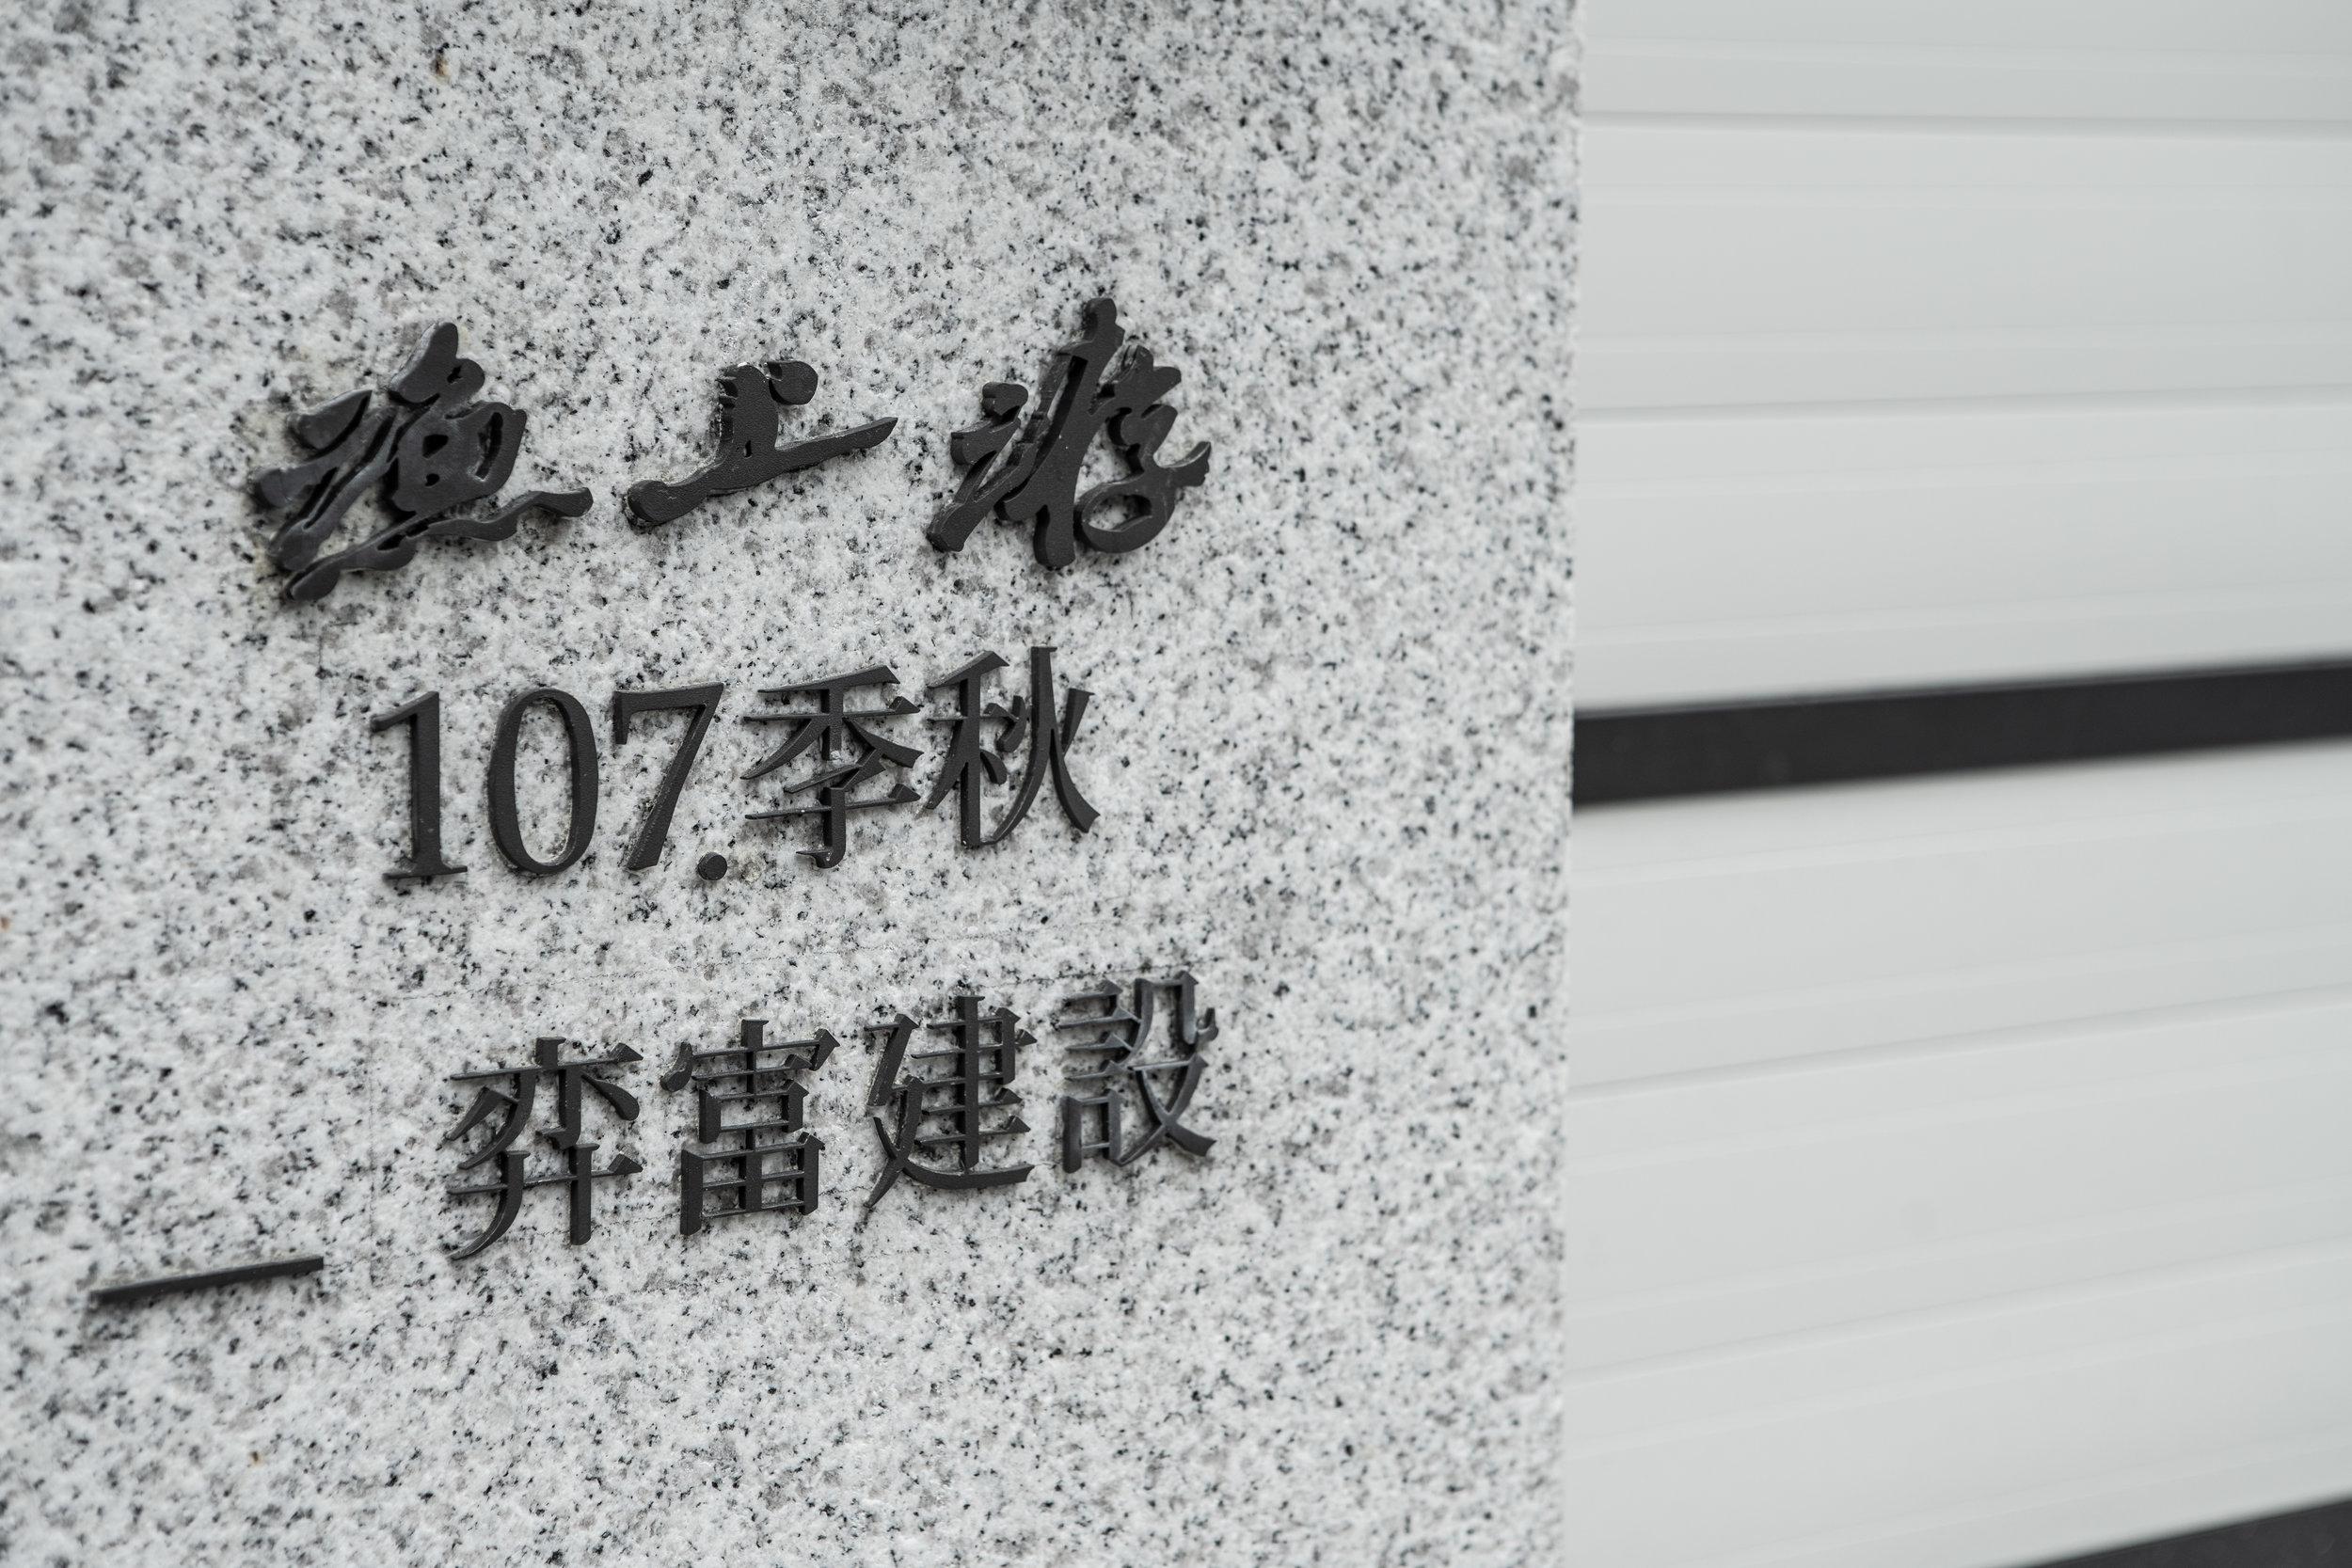 075-DSC04317.jpg